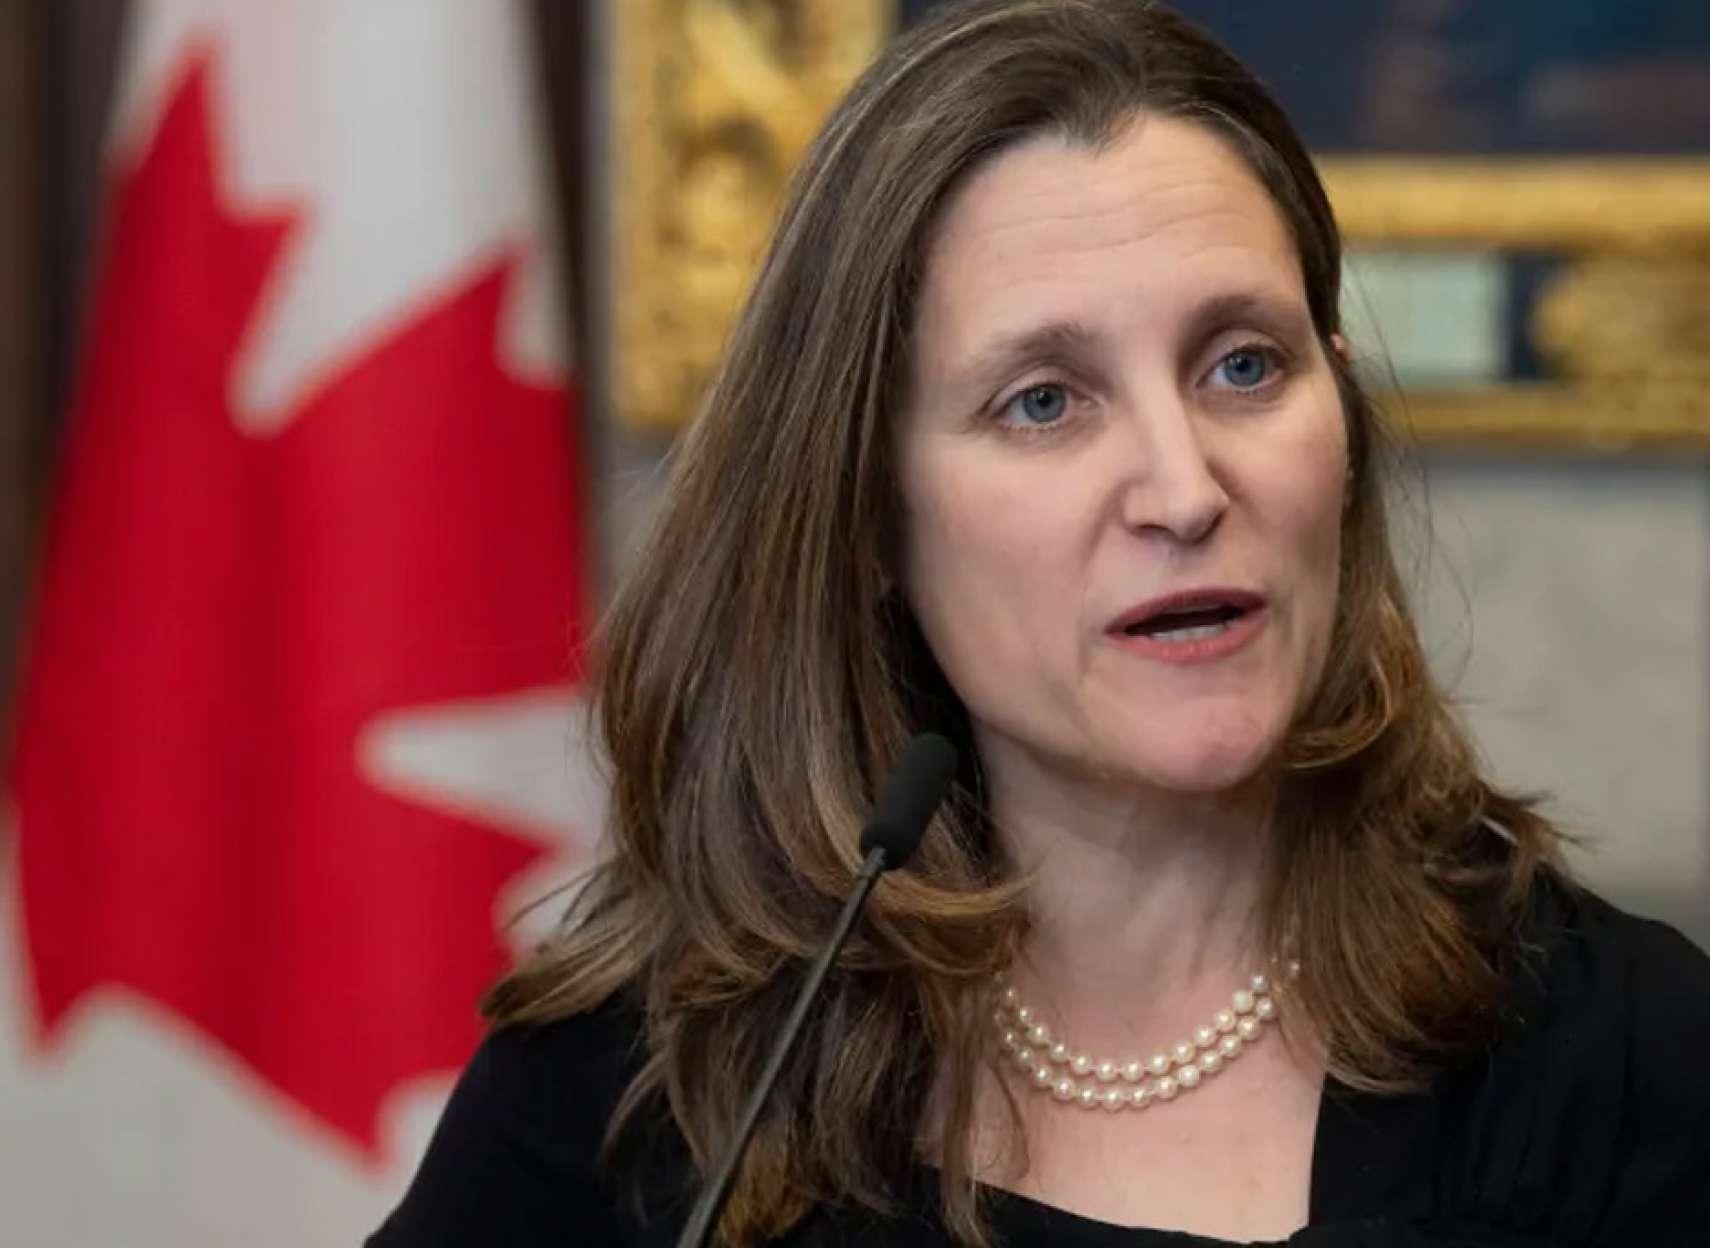 اخبار-کانادا-جاستین-ترودو-برای-مقابله-با-کرونا-کمیته-تشکیل-داد